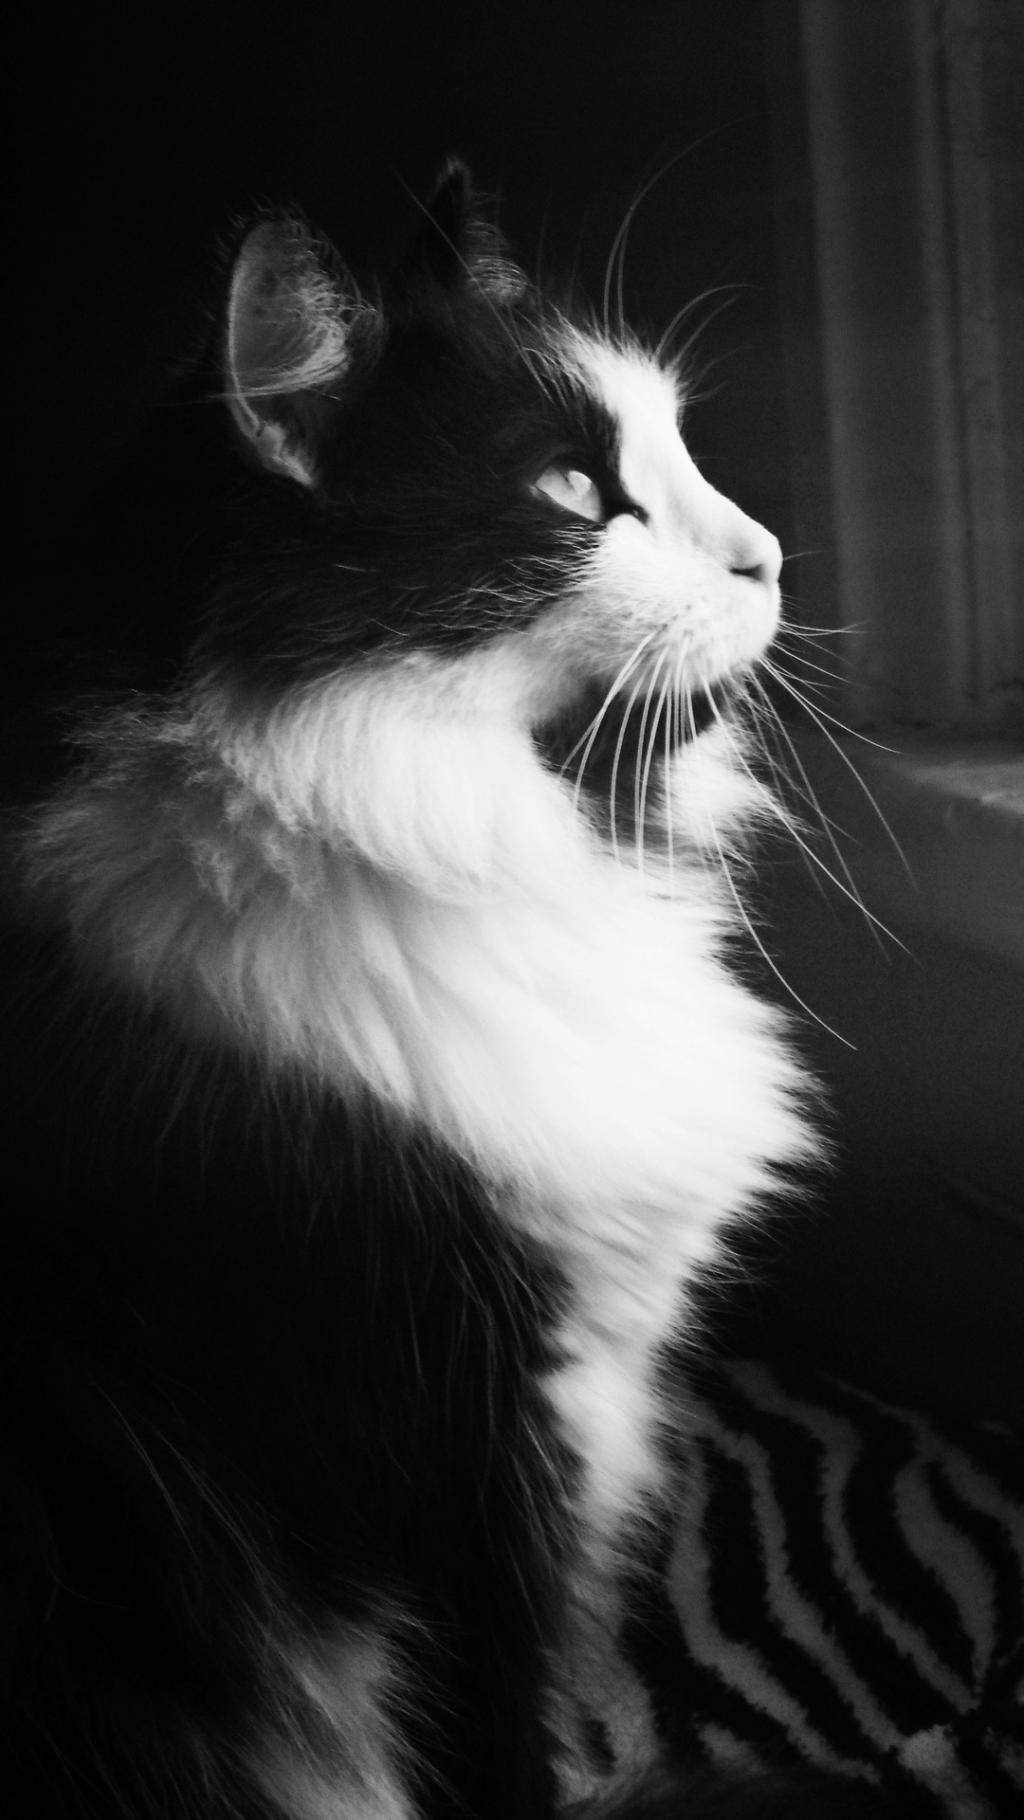 Htc One Wallpaper Hd 望向窗外的猫 锁屏图片 高清手机壁纸 动物 回车桌面